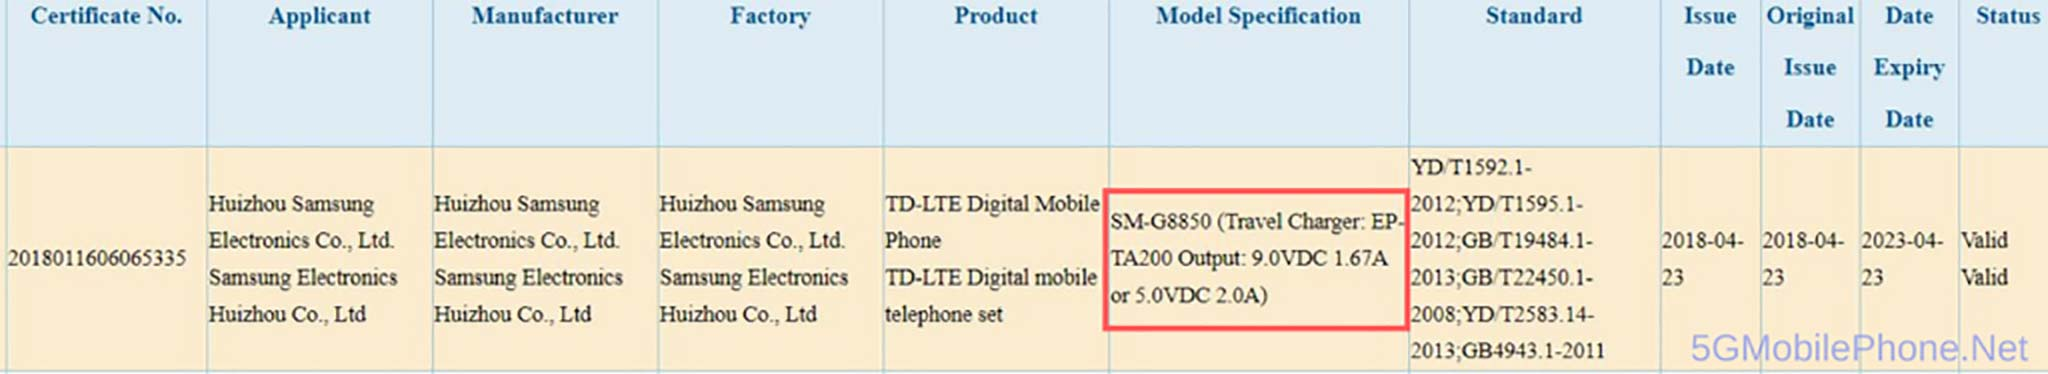 Samsung-Galaxy-A8-Star-3C-1024x187.jpg